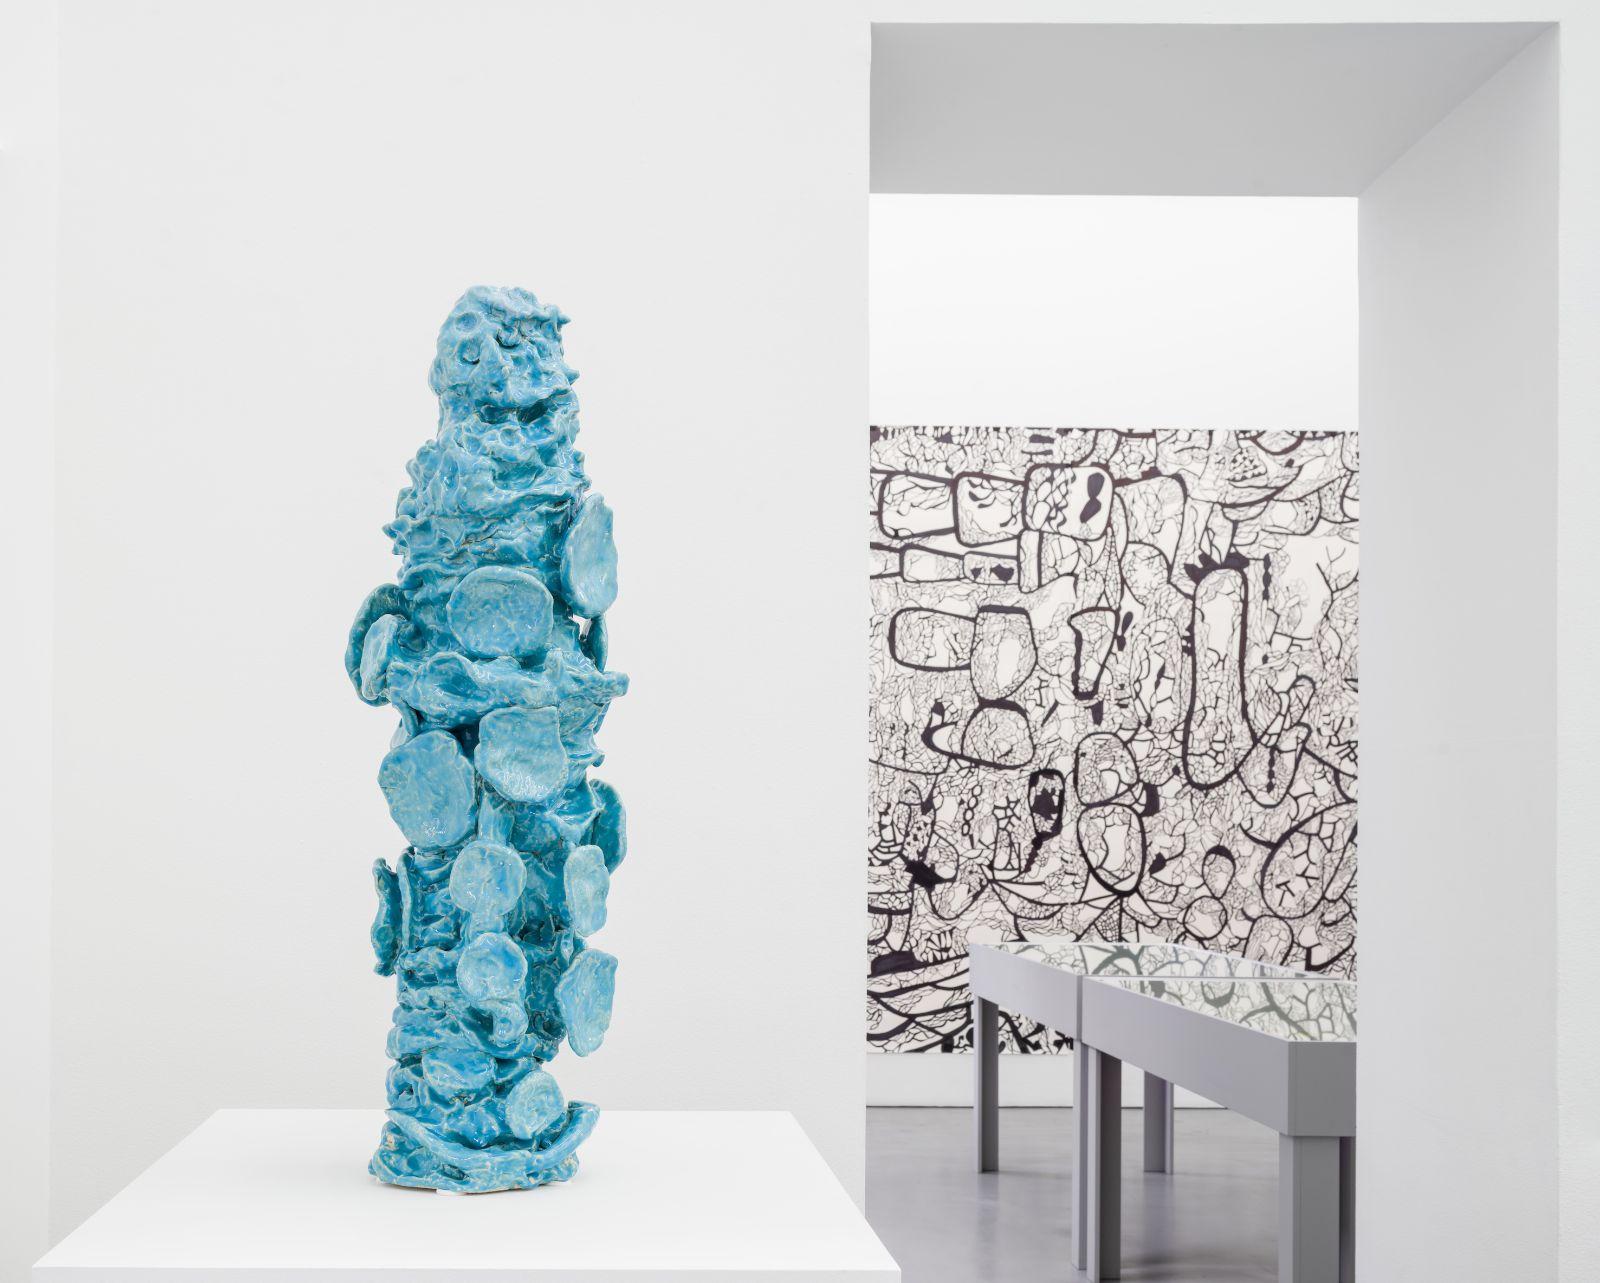 The Libertines No. 06, 2014, glazed ceramics, 90 cm